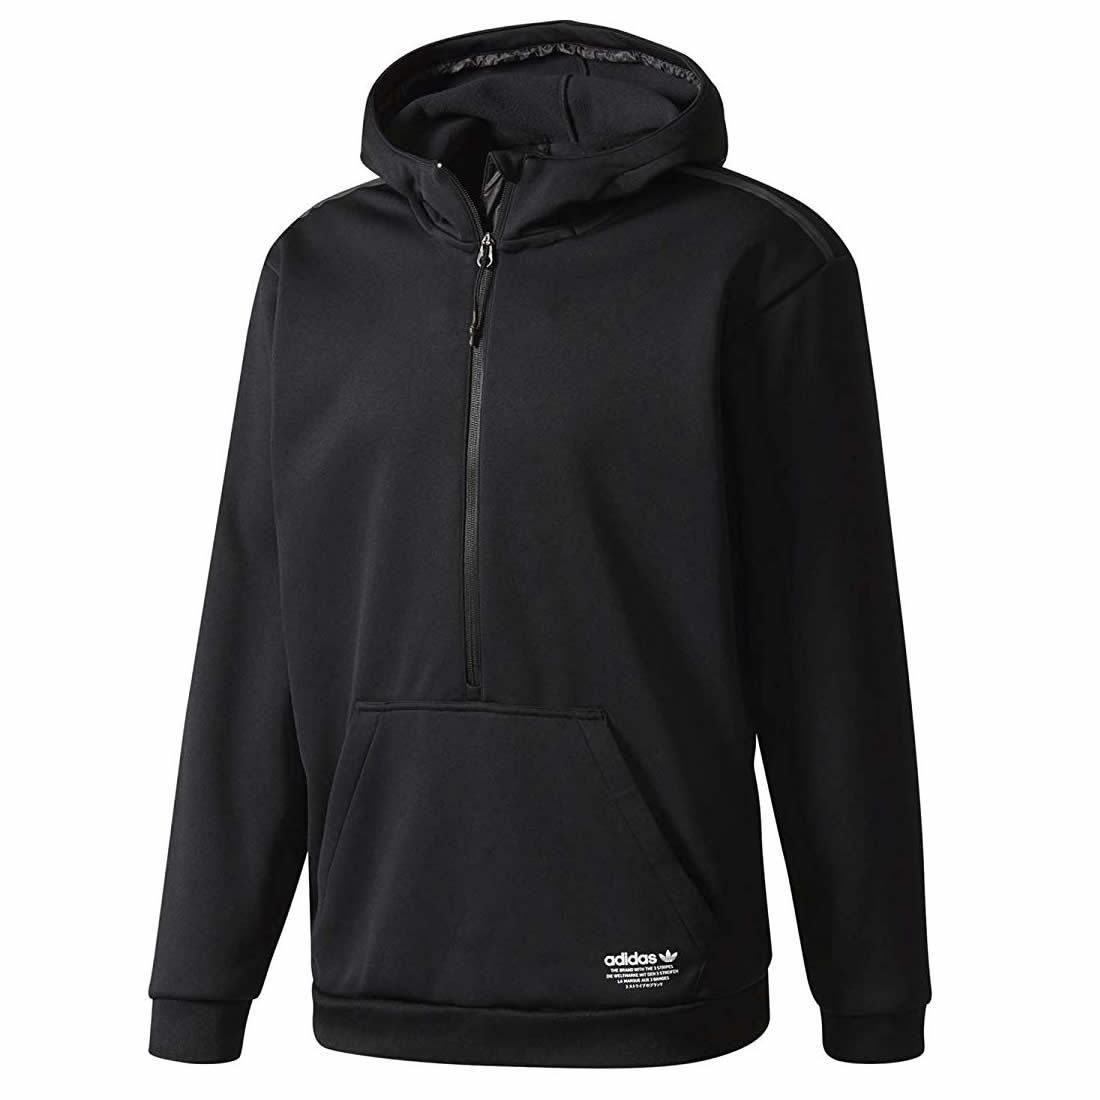 adidas Originals Men/'s Full Zip Hooded Jacket Trefoil Logo Hoodie Black XS